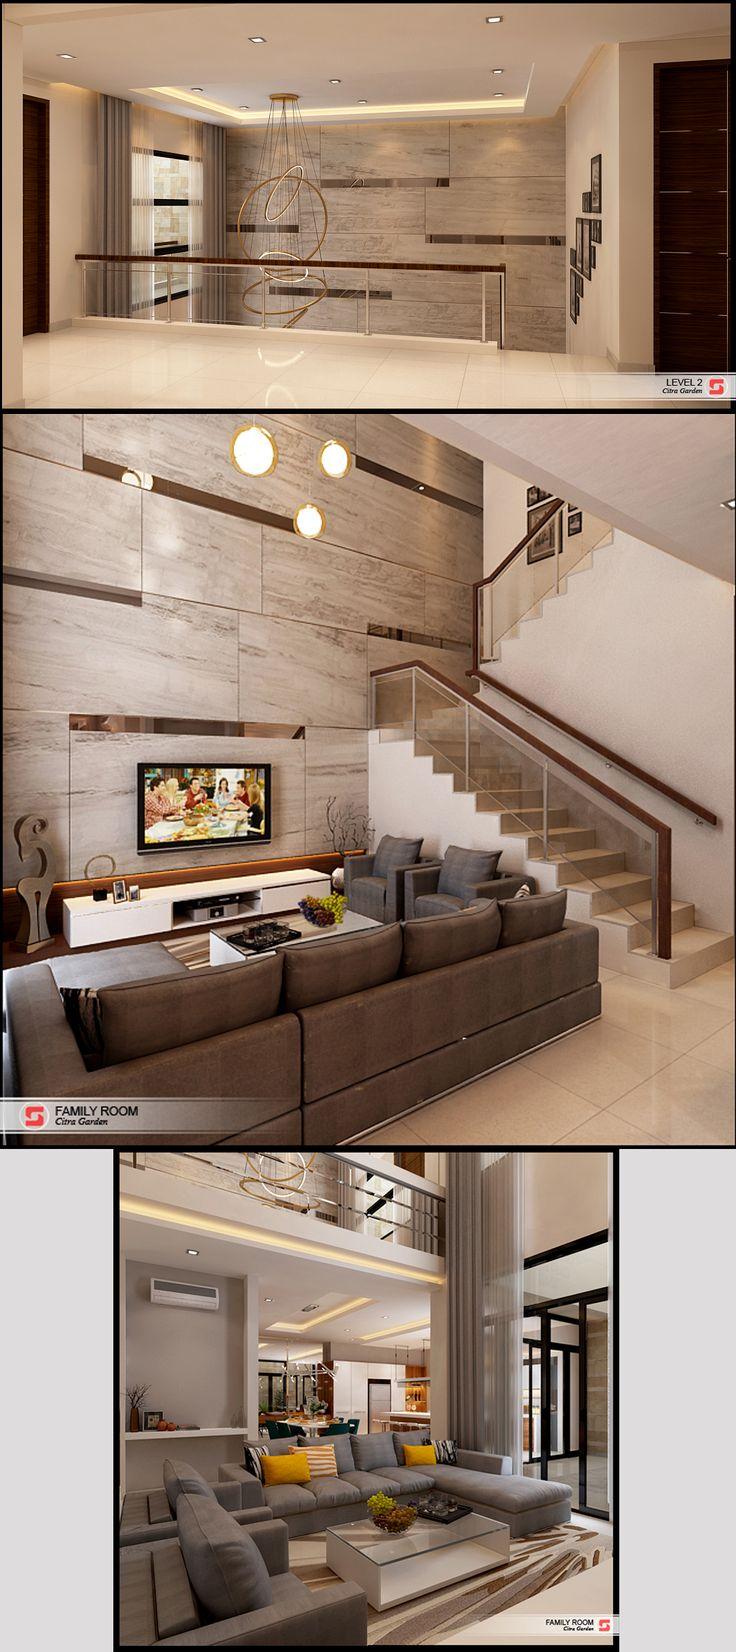 Family Living Room  D House Residential Medan, Sumatera Utara Indonesia